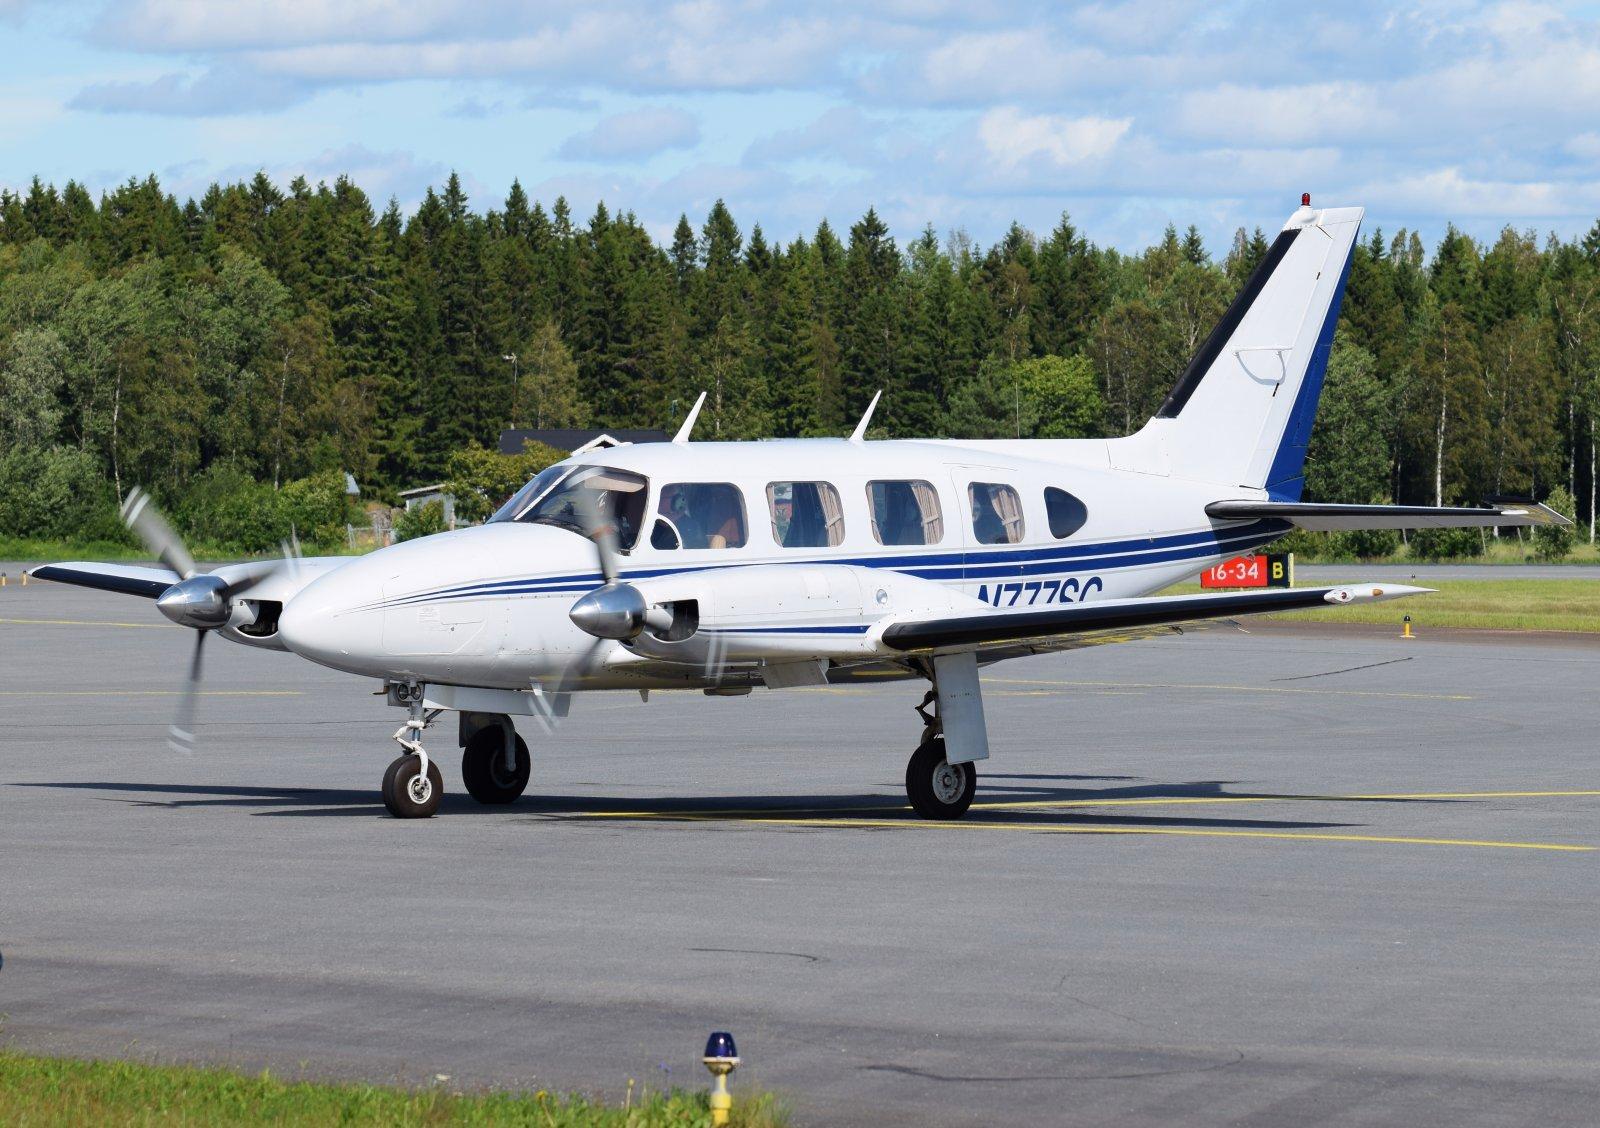 N777SC - Piper PA-31-310 Navajo - 1.7.2019